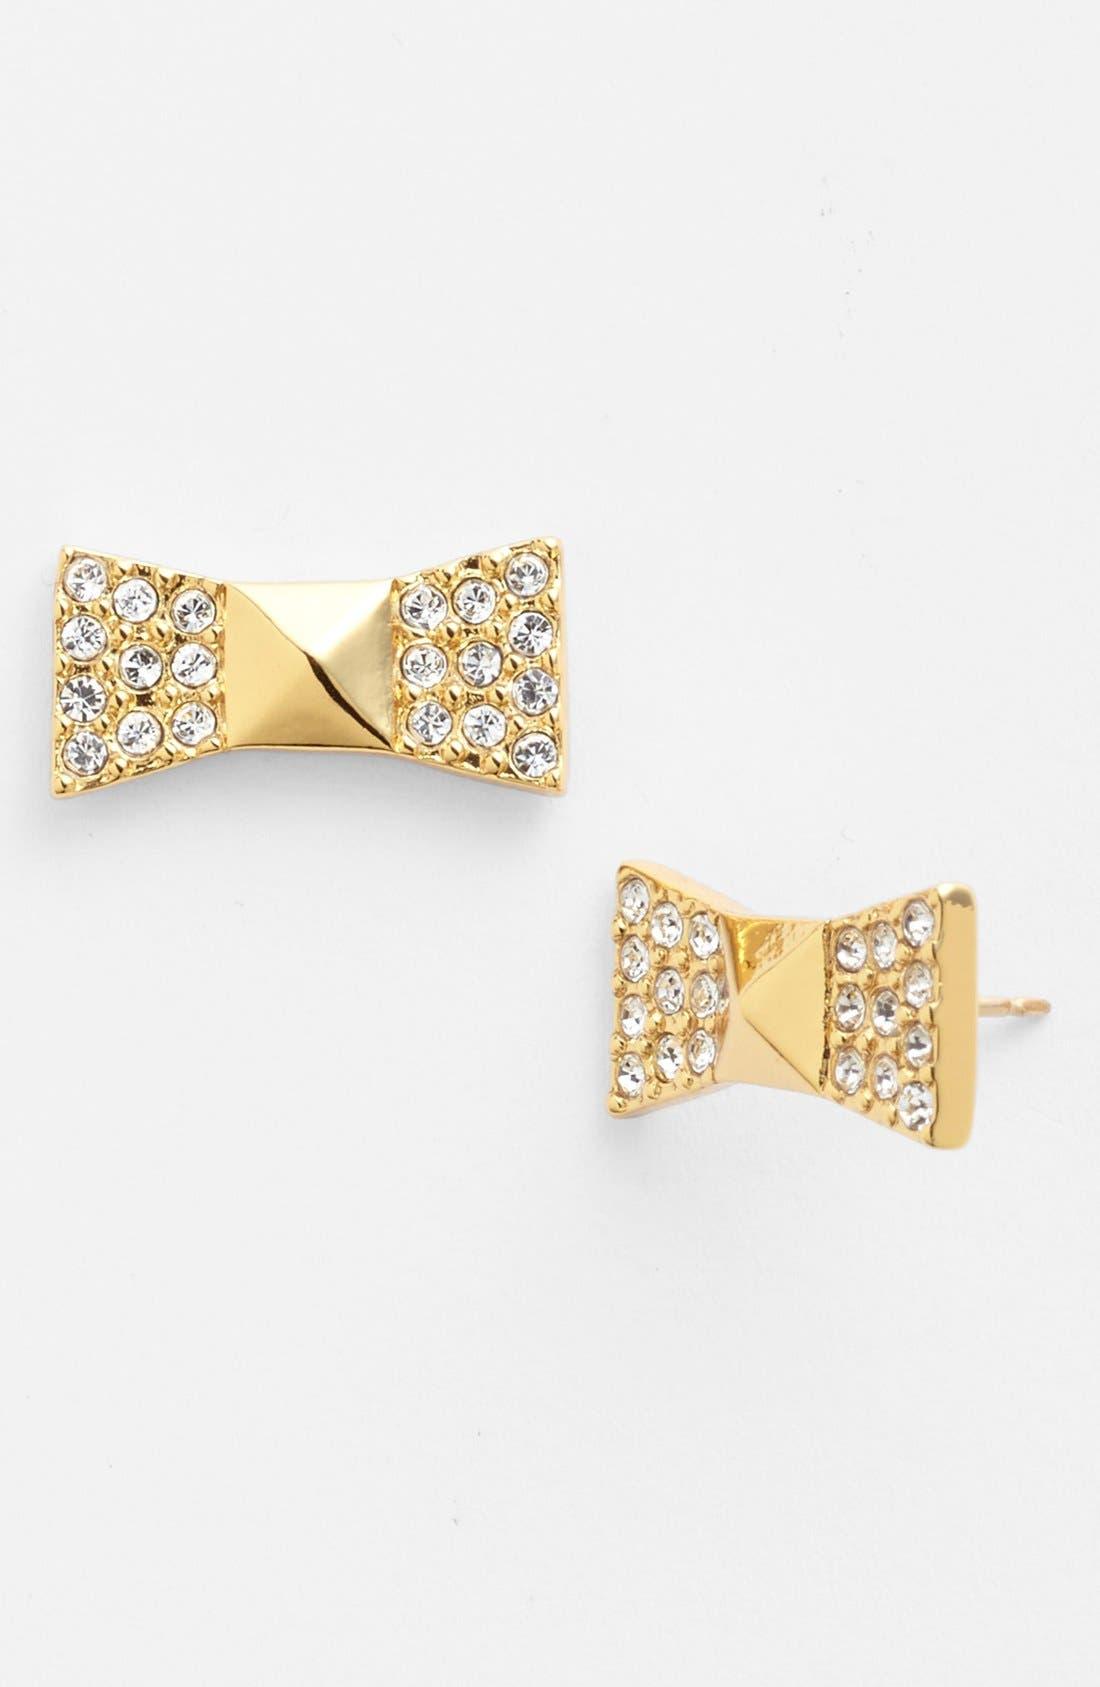 Main Image - kate spade new york 'locked in' pavé bow stud earrings